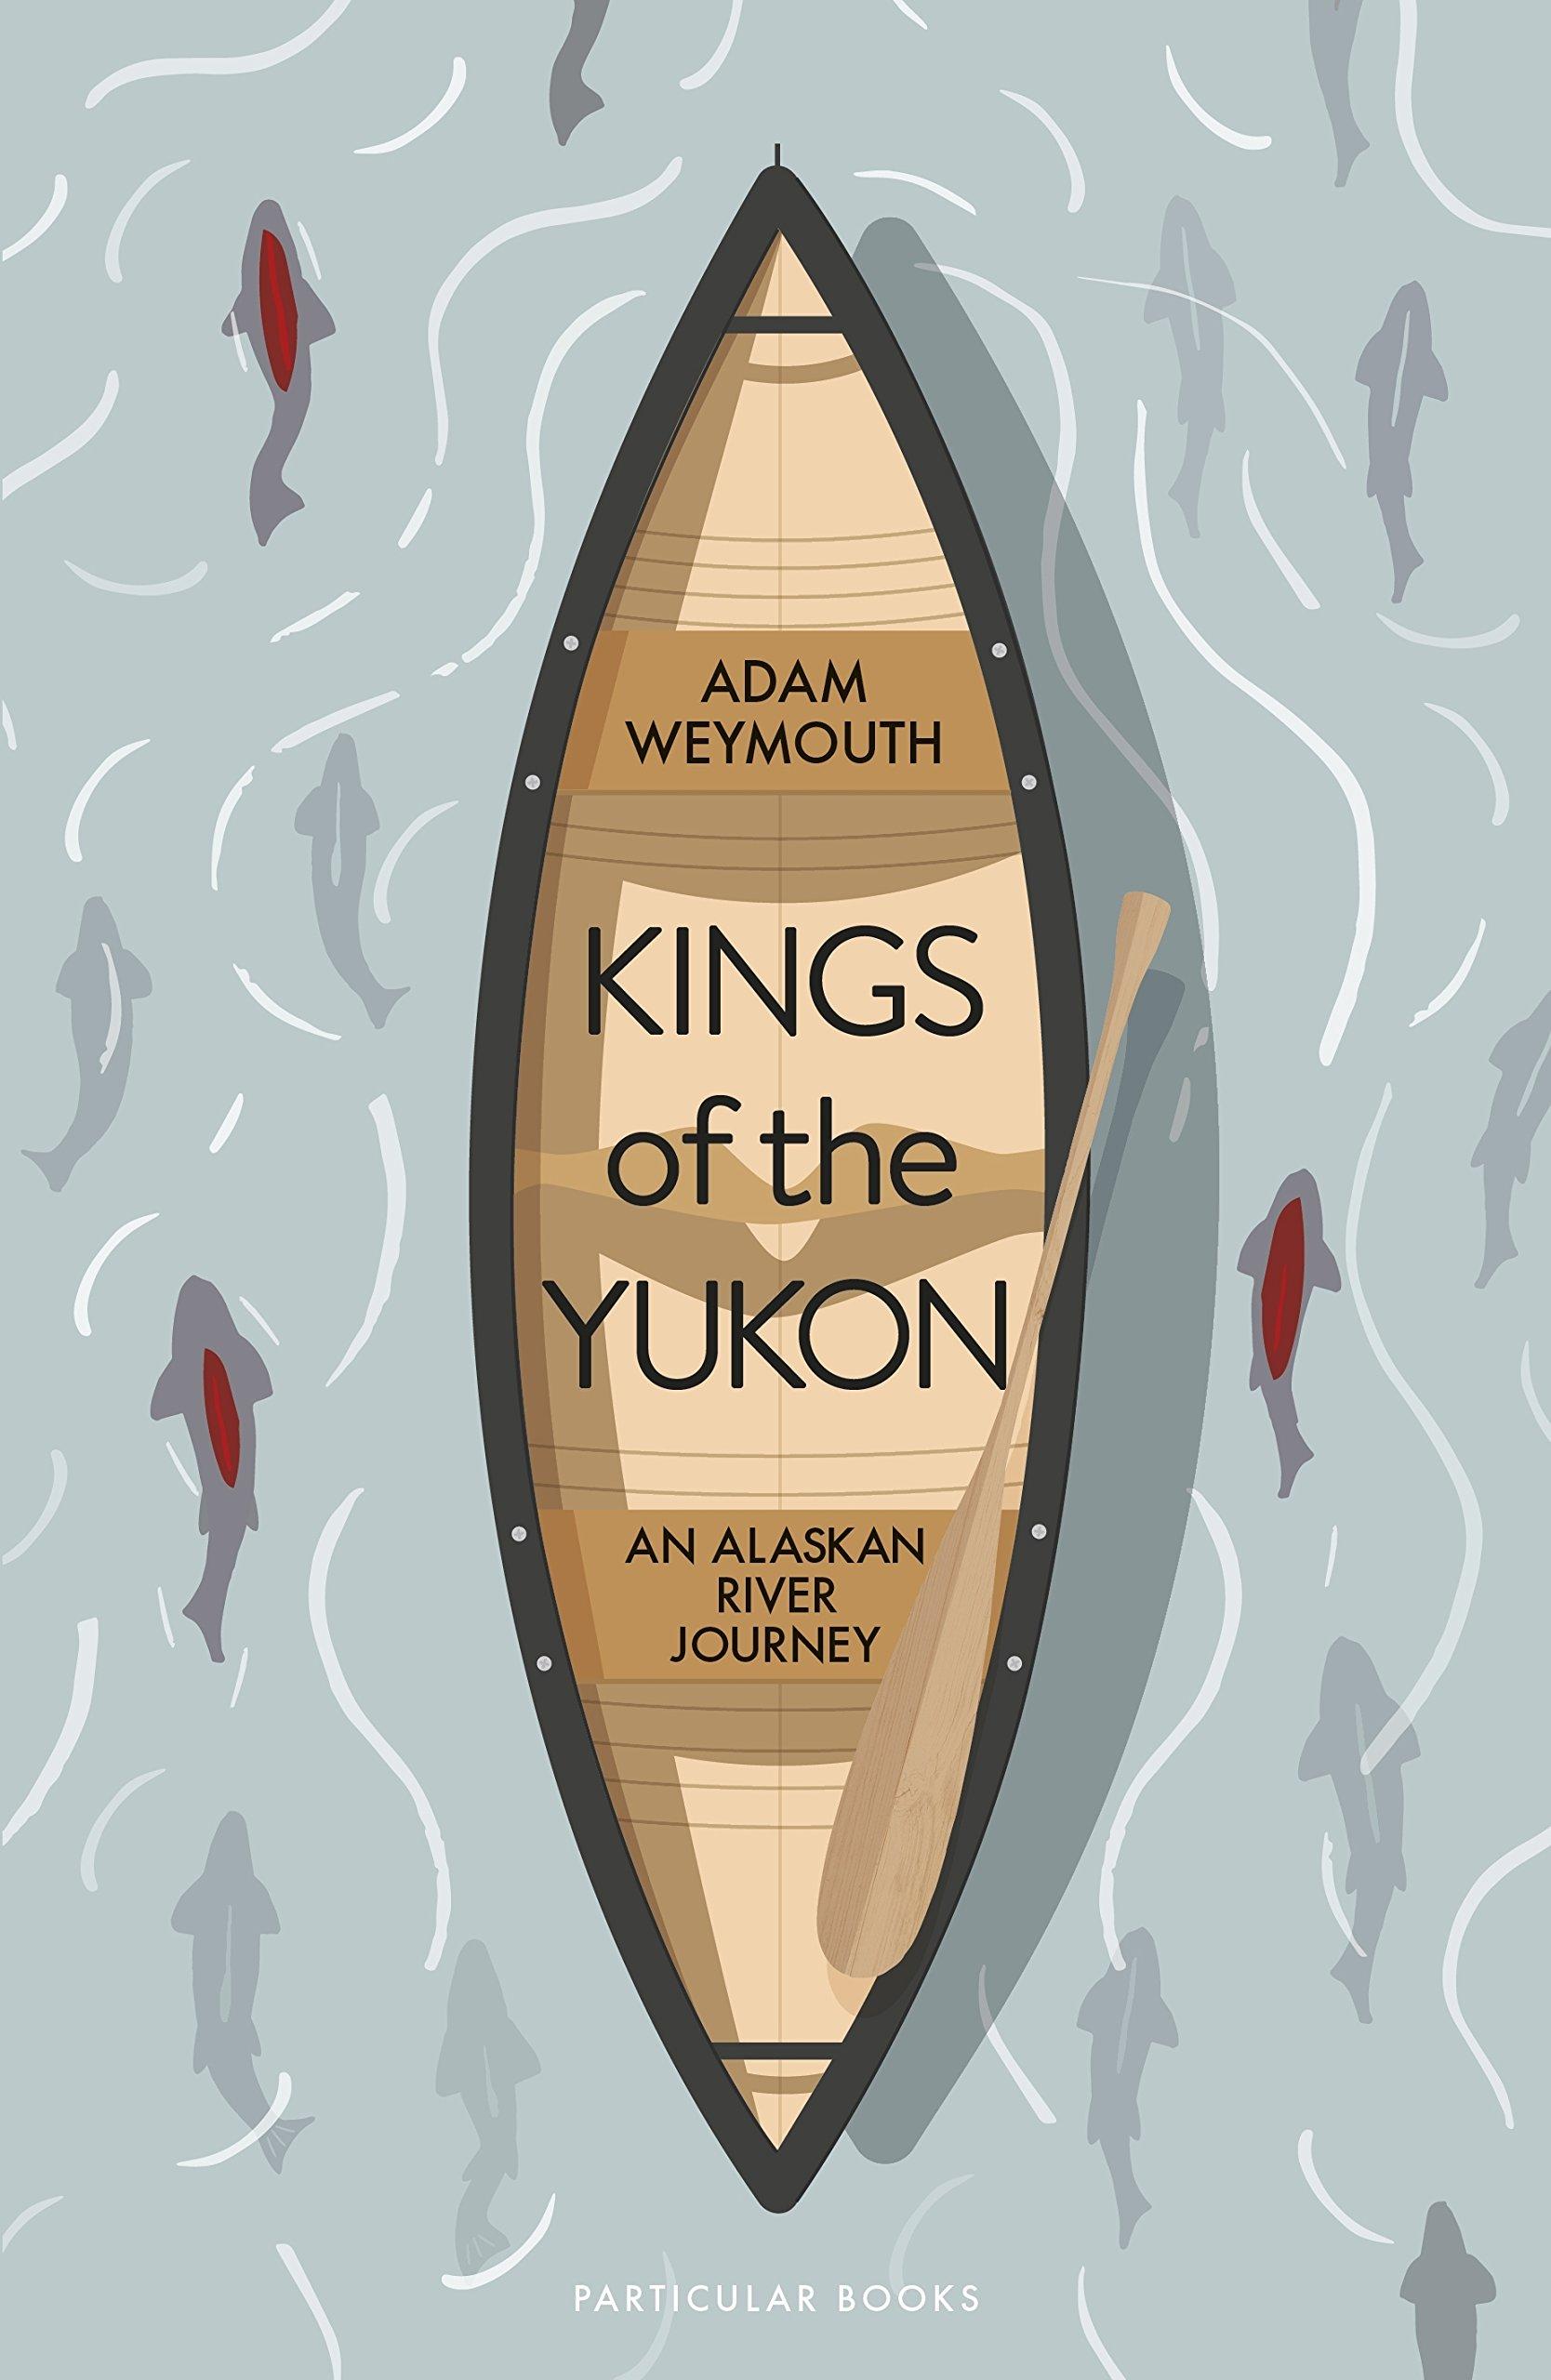 Kings of the Yukon: An Alaskan River Journey: Amazon.co.uk ...